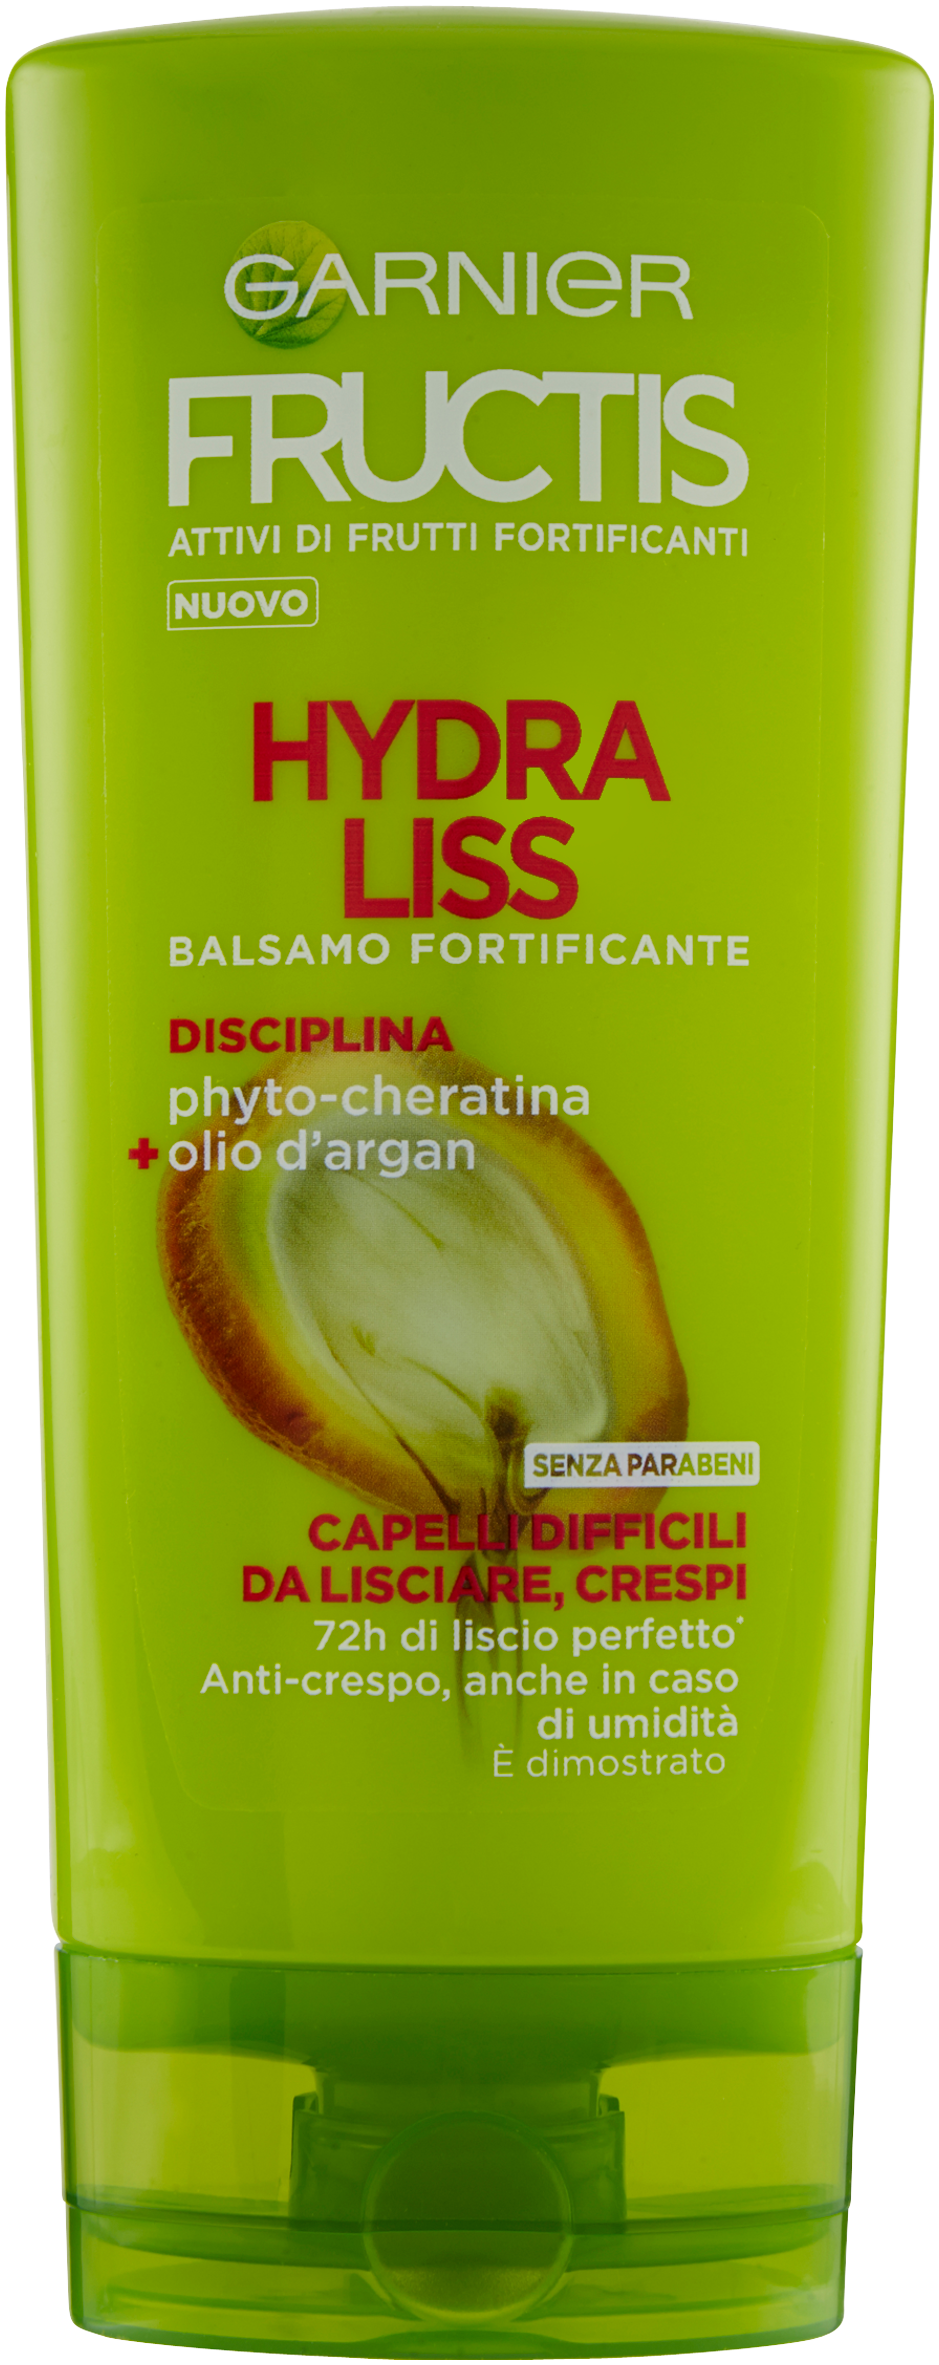 BALSAMO FRUCTIS HIDRA-LISS ARIDI 200ML